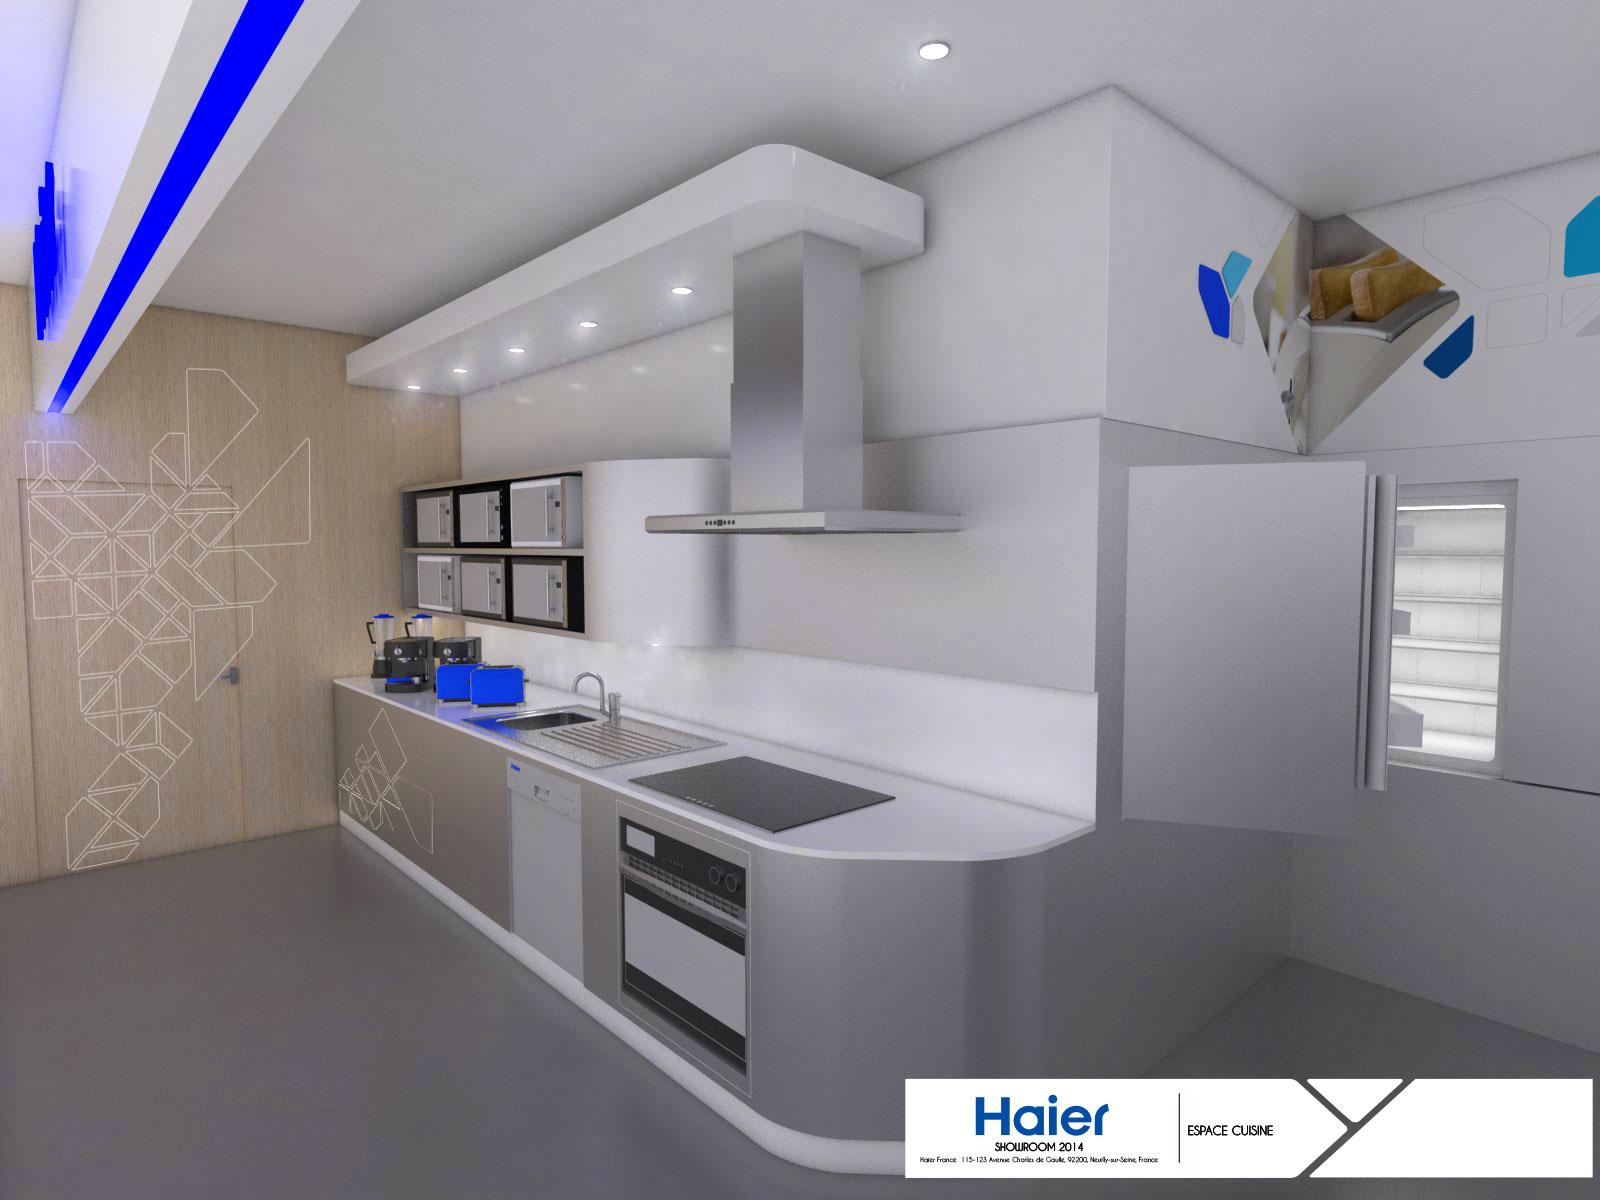 showroom cuisine paris trendy showroom cuisine paris with showroom cuisine paris top hd. Black Bedroom Furniture Sets. Home Design Ideas